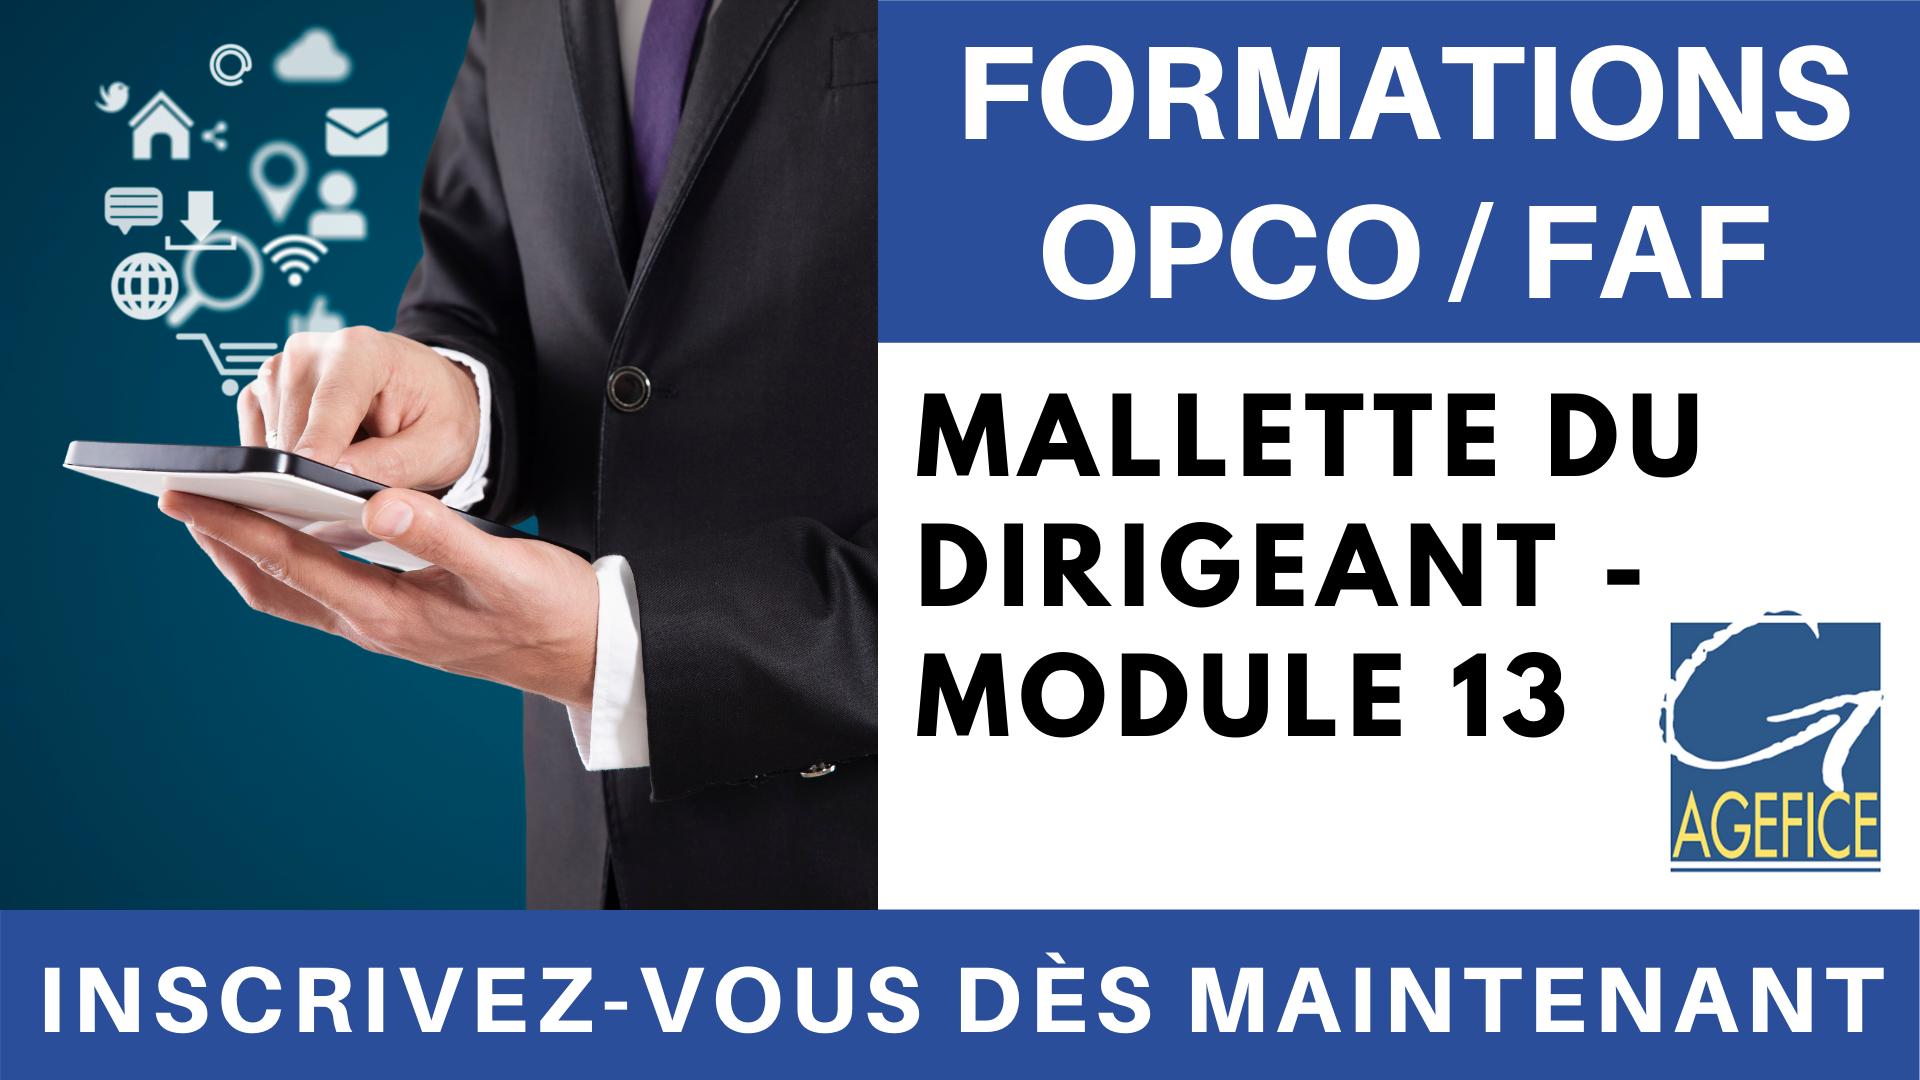 Vidéo - Formation OPCO_FAF Mallette du dirigeant mod 13